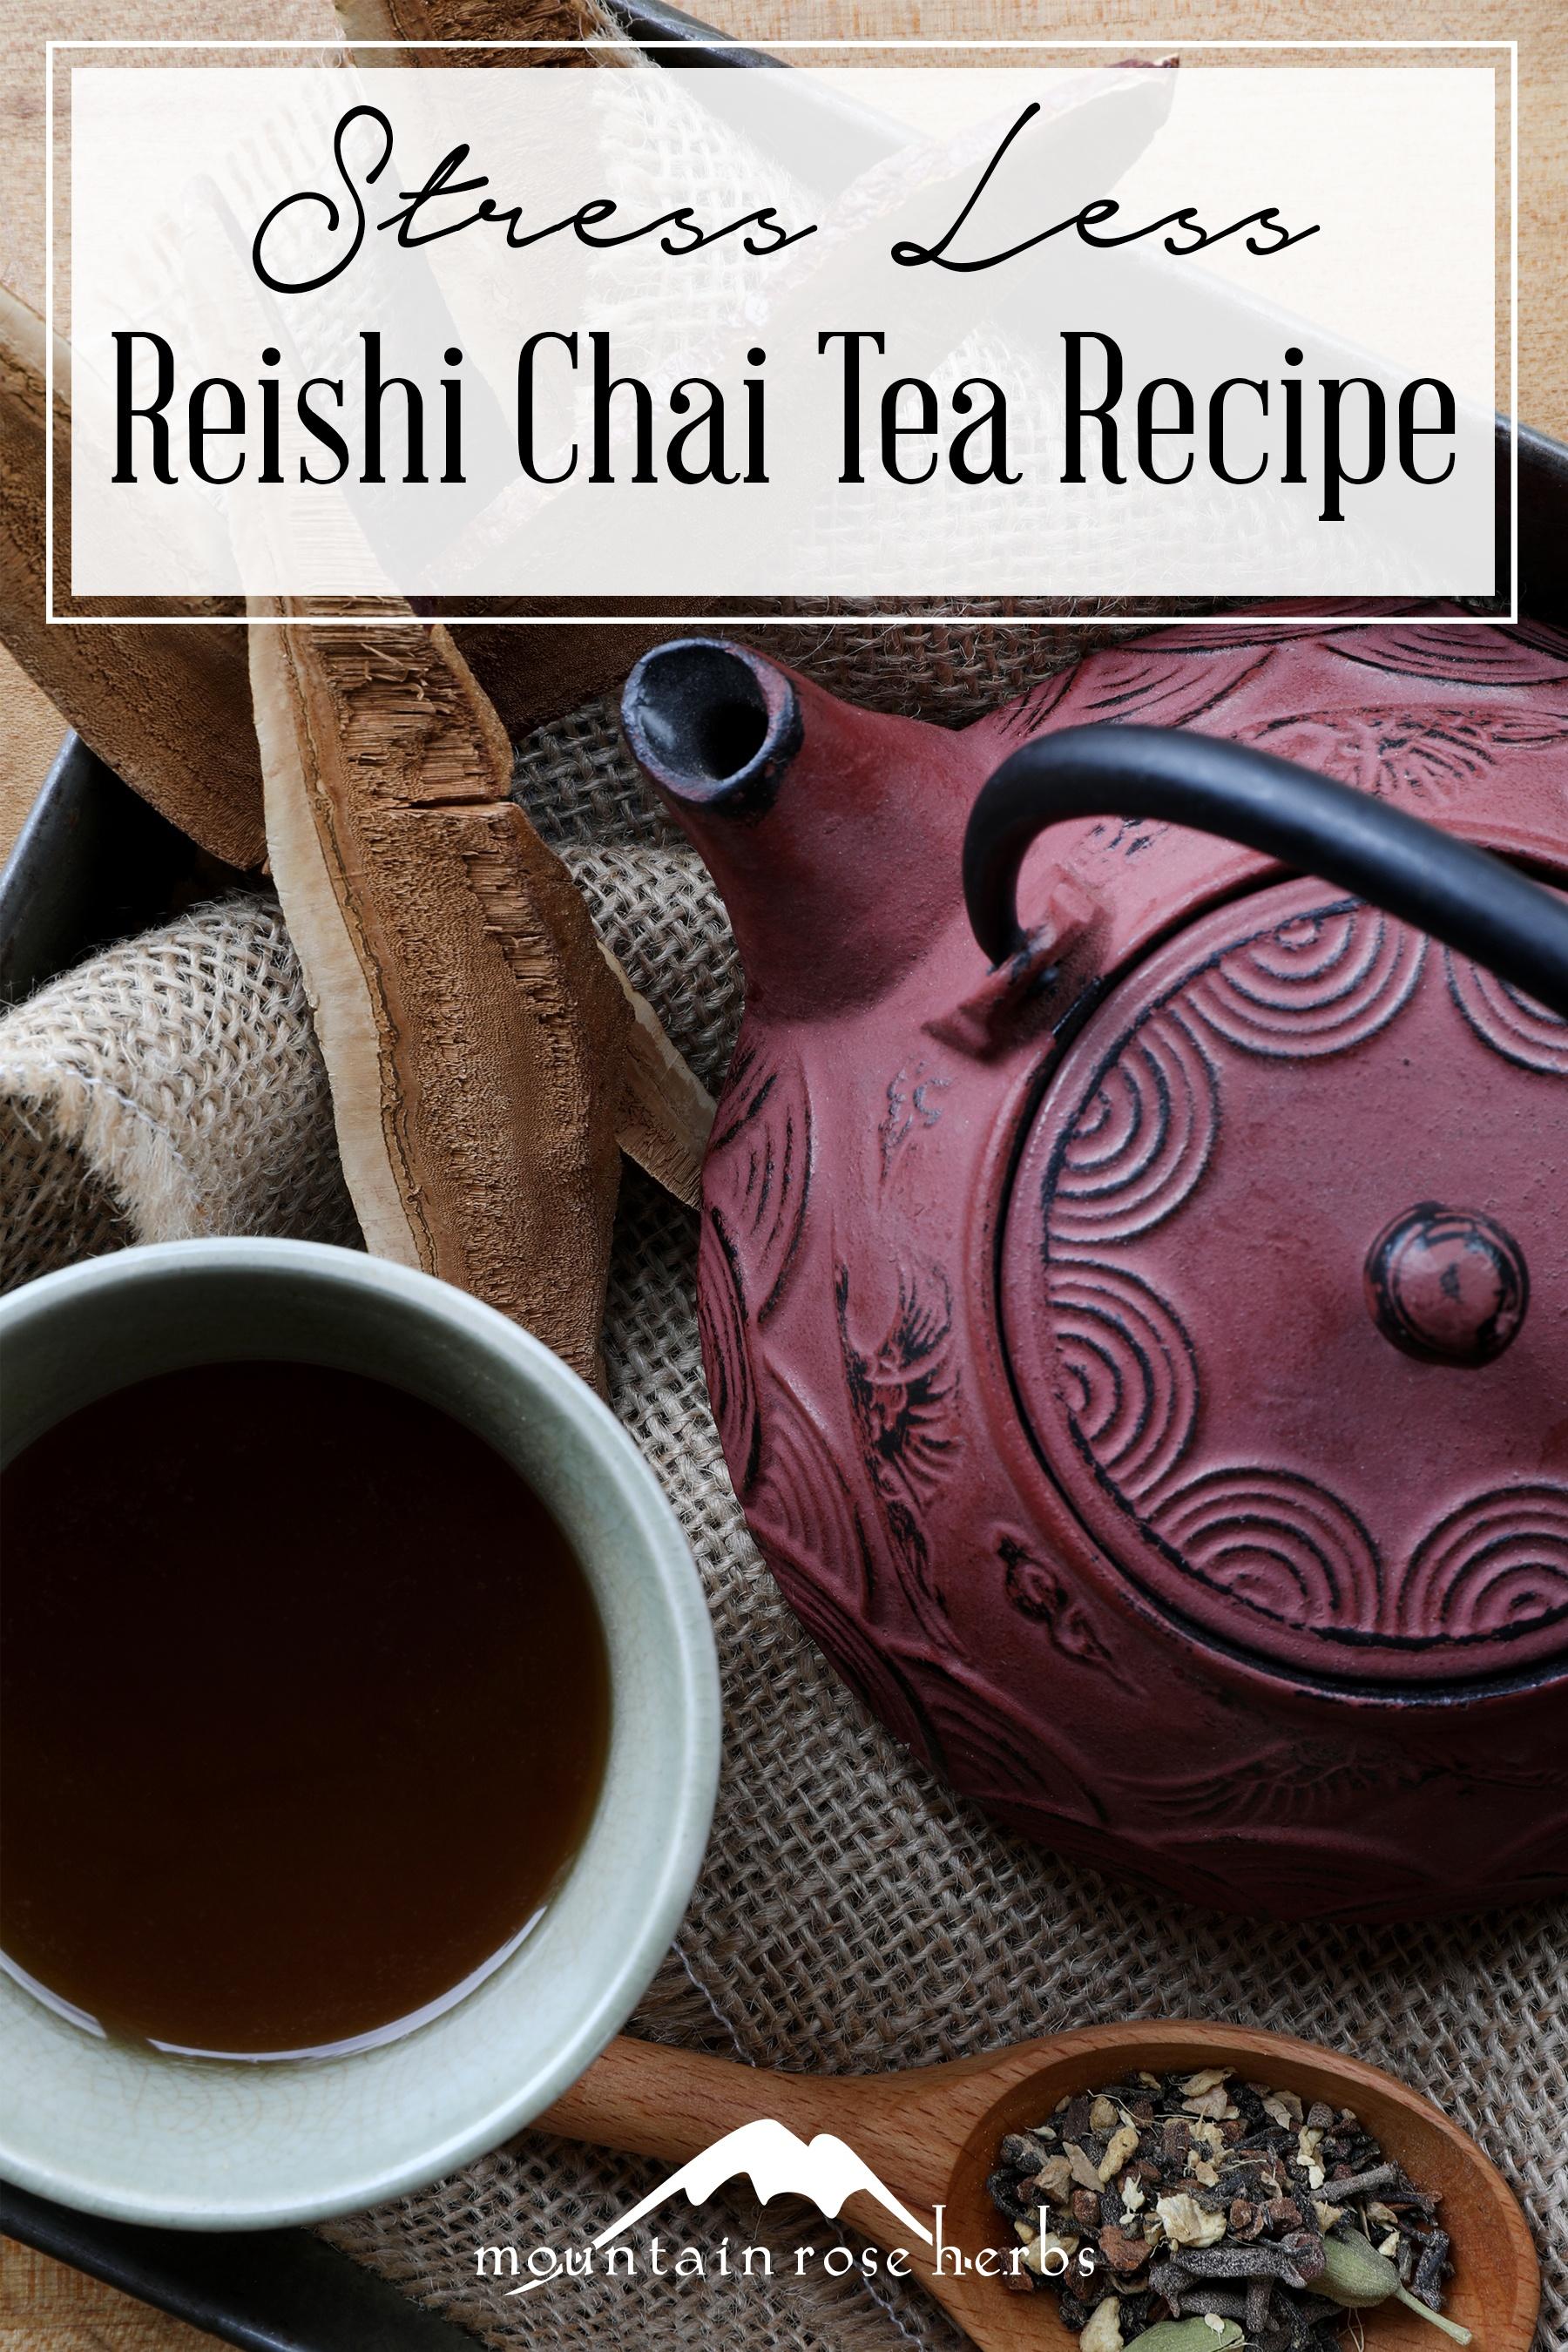 Pin for Reish Chai Immune Tea Recipe from Mountain Rose Herbs